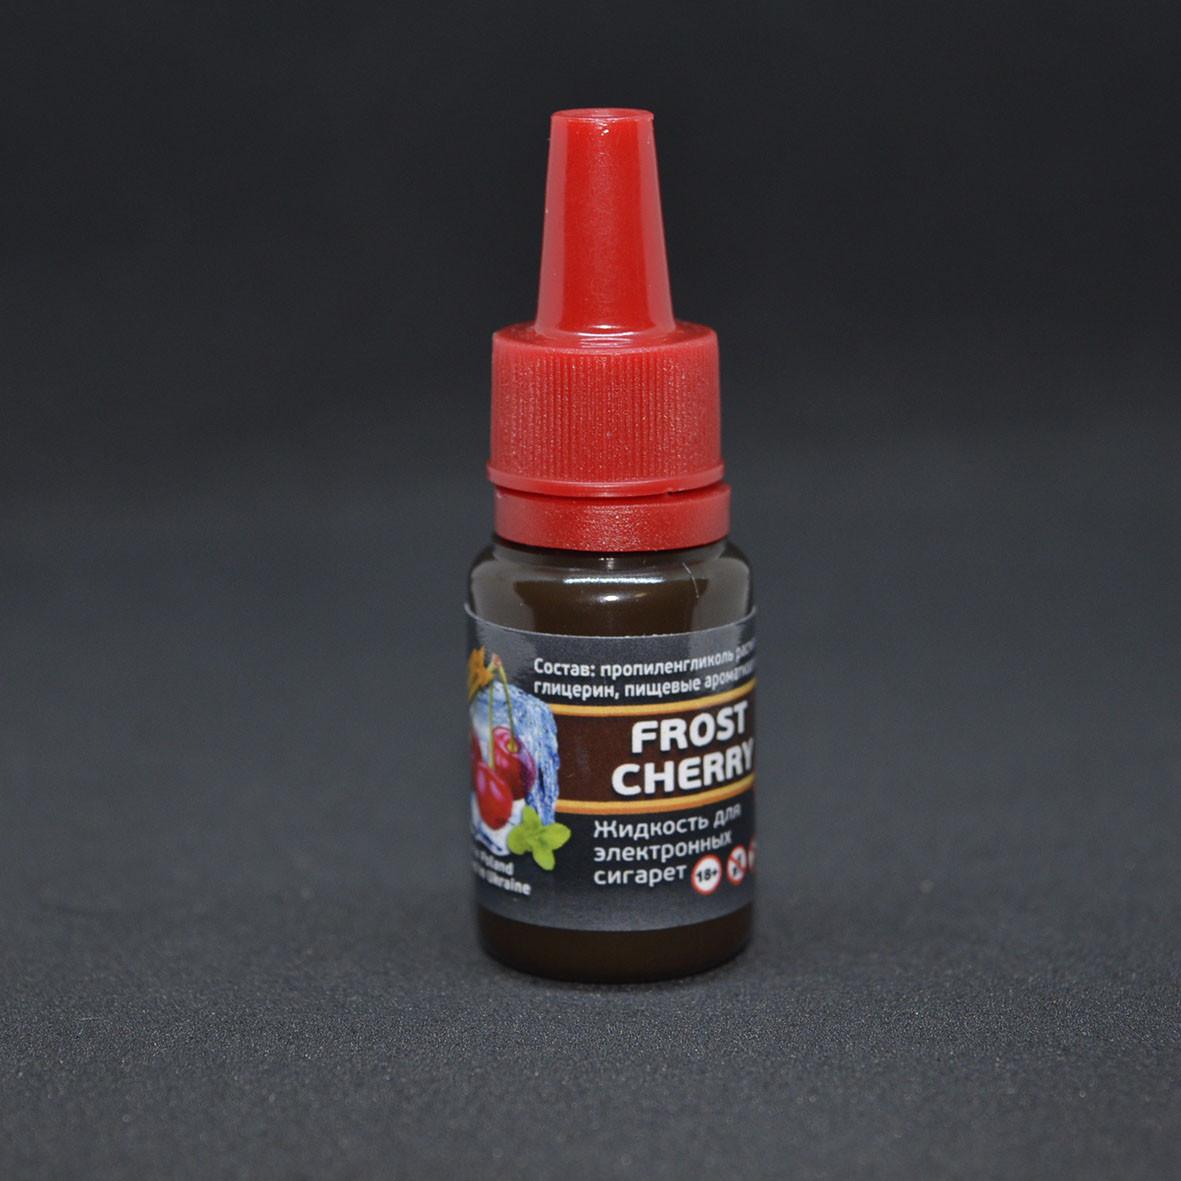 "Жидкость для электронной сигареты ""Ледяная Вишня"" 12мг/мл"